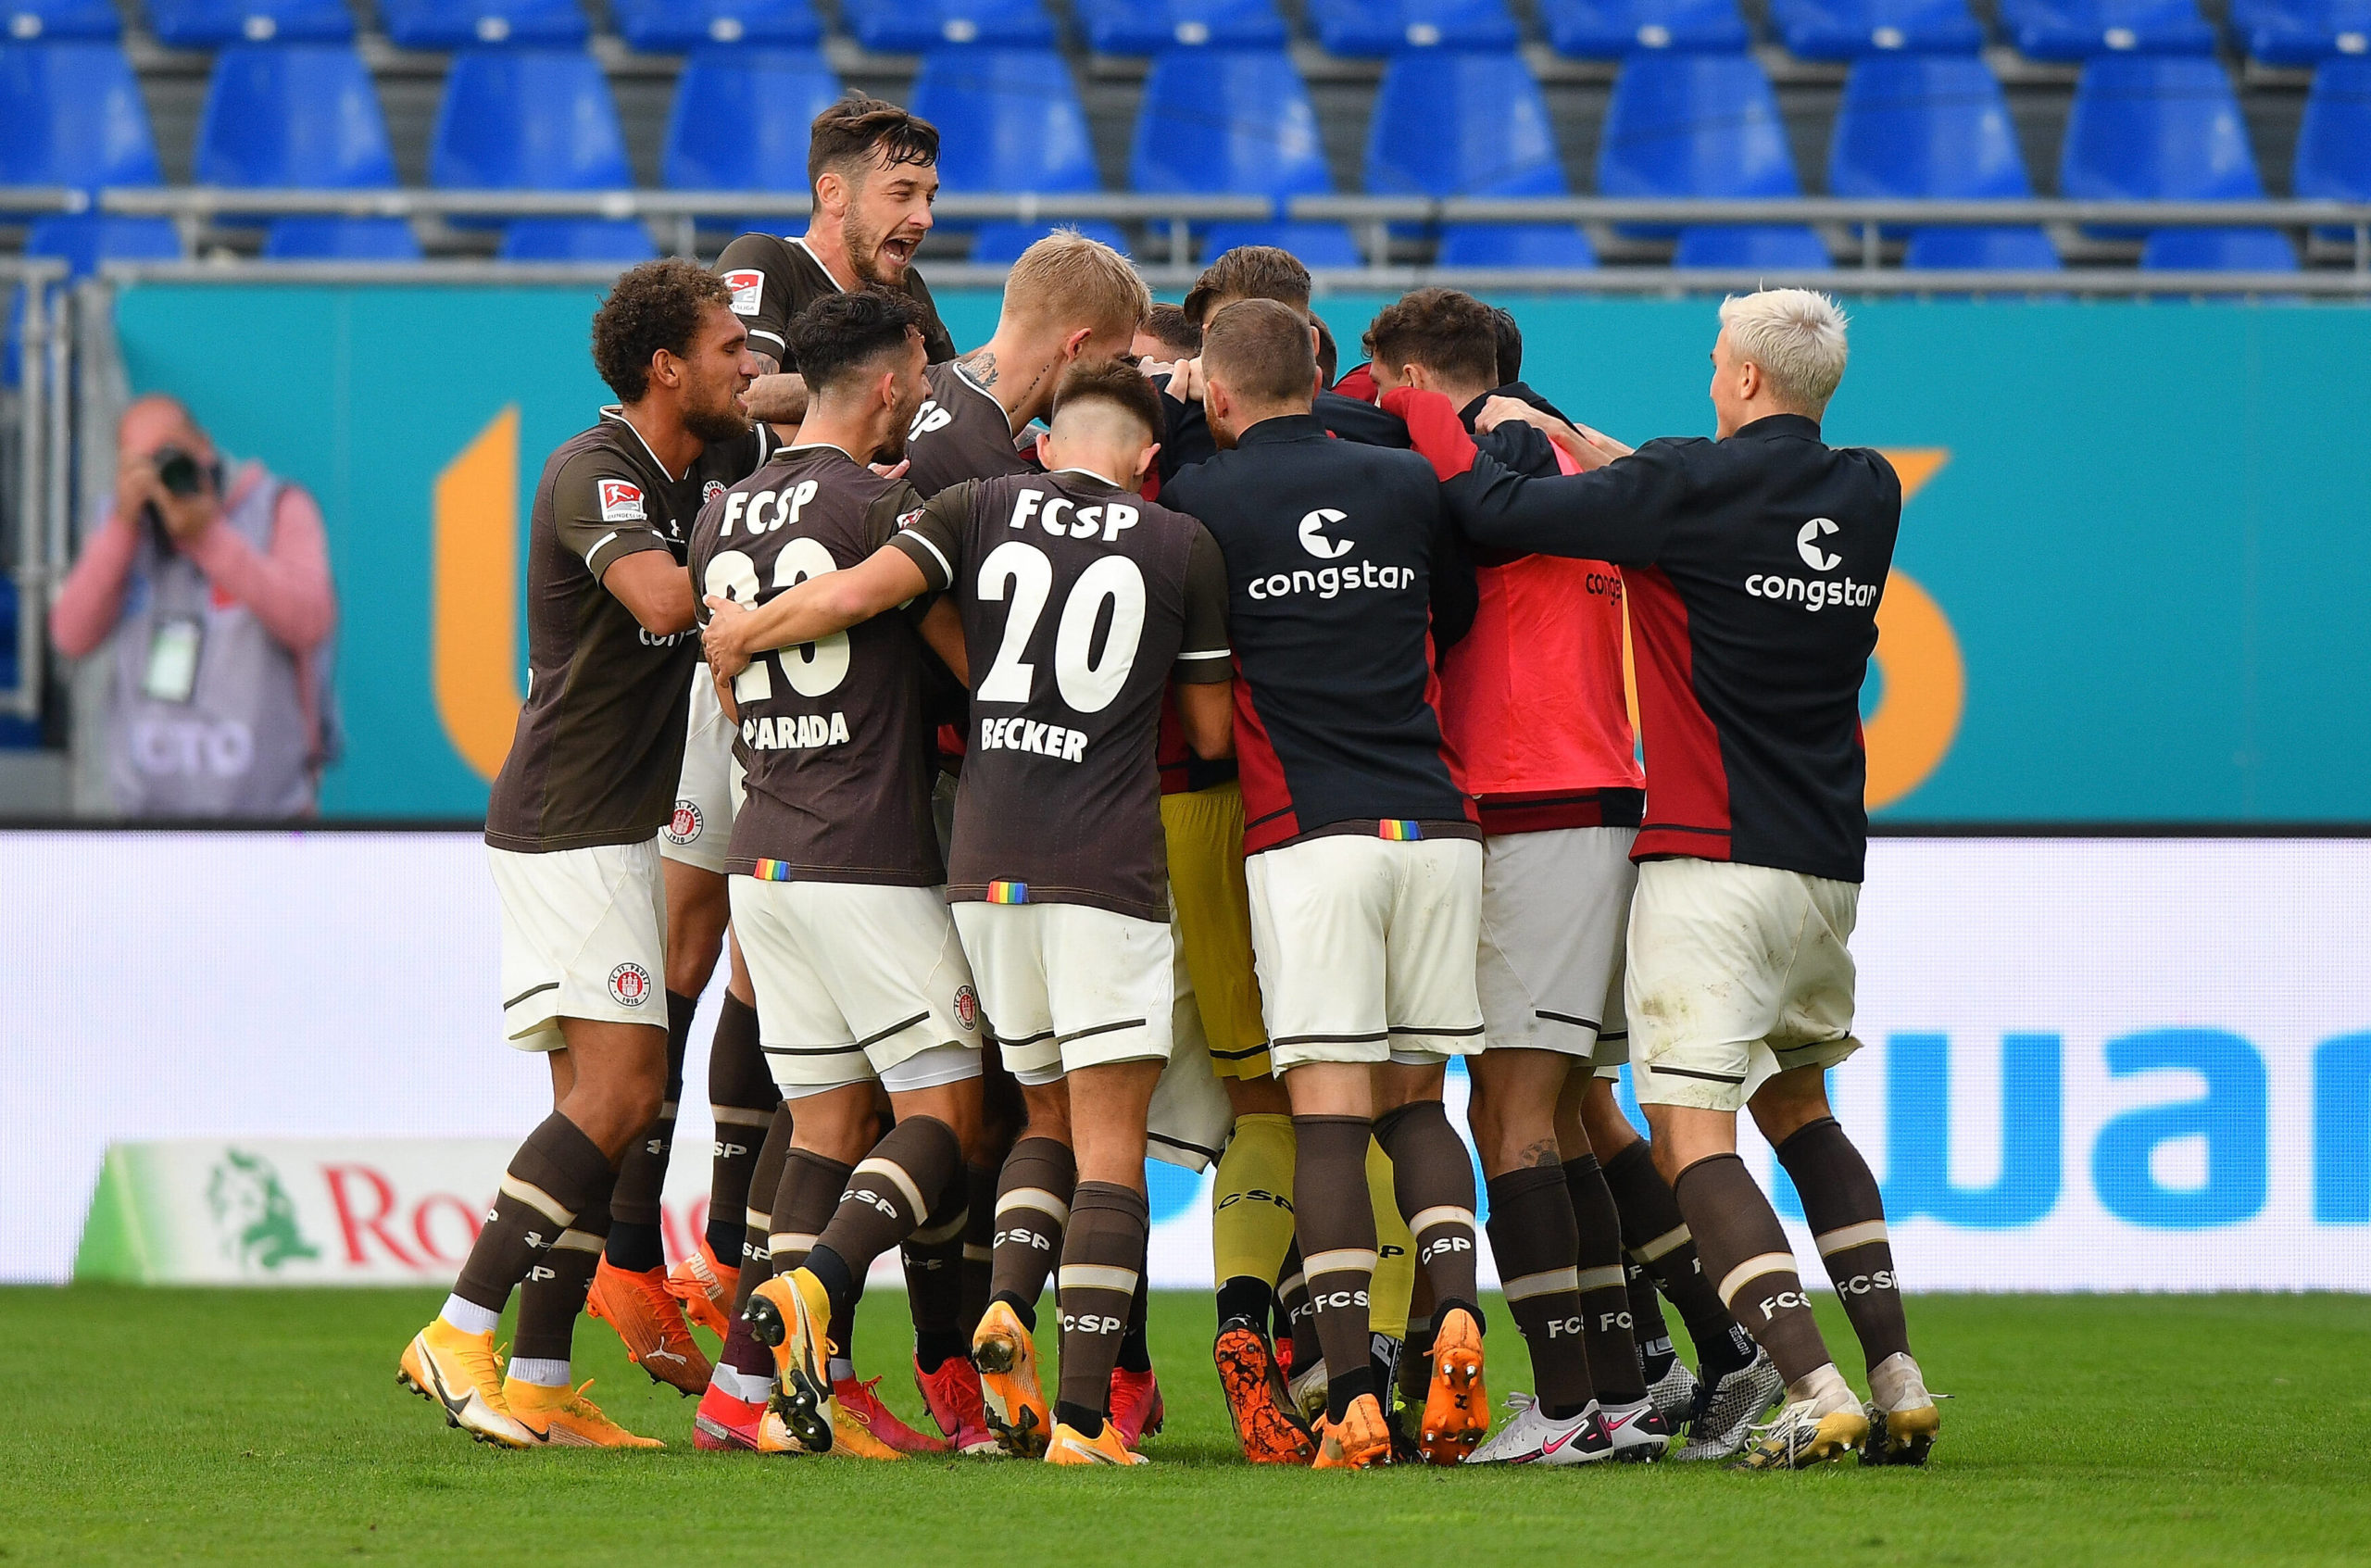 SV Darmstadt 98 – FC St. Pauli 2:2 – A sure bet